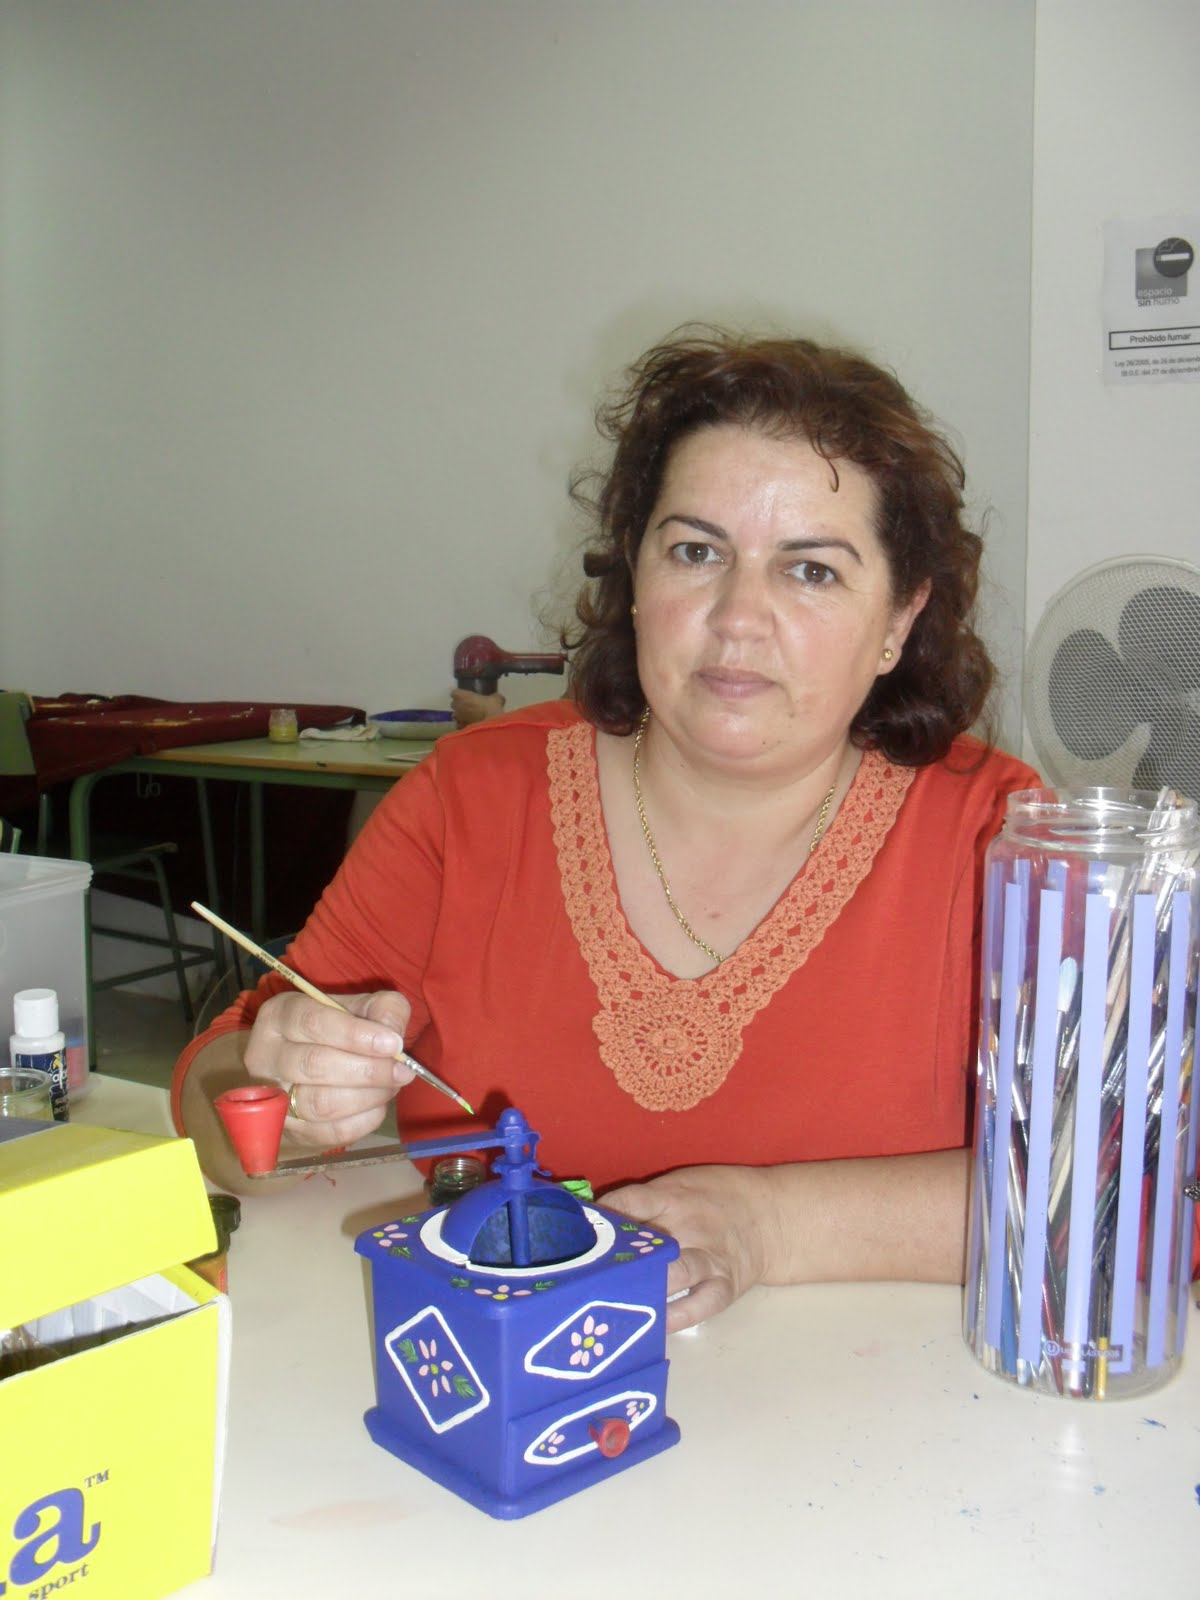 Maria jimenez quintana pictures news information from - Youtube maria jimenez ...